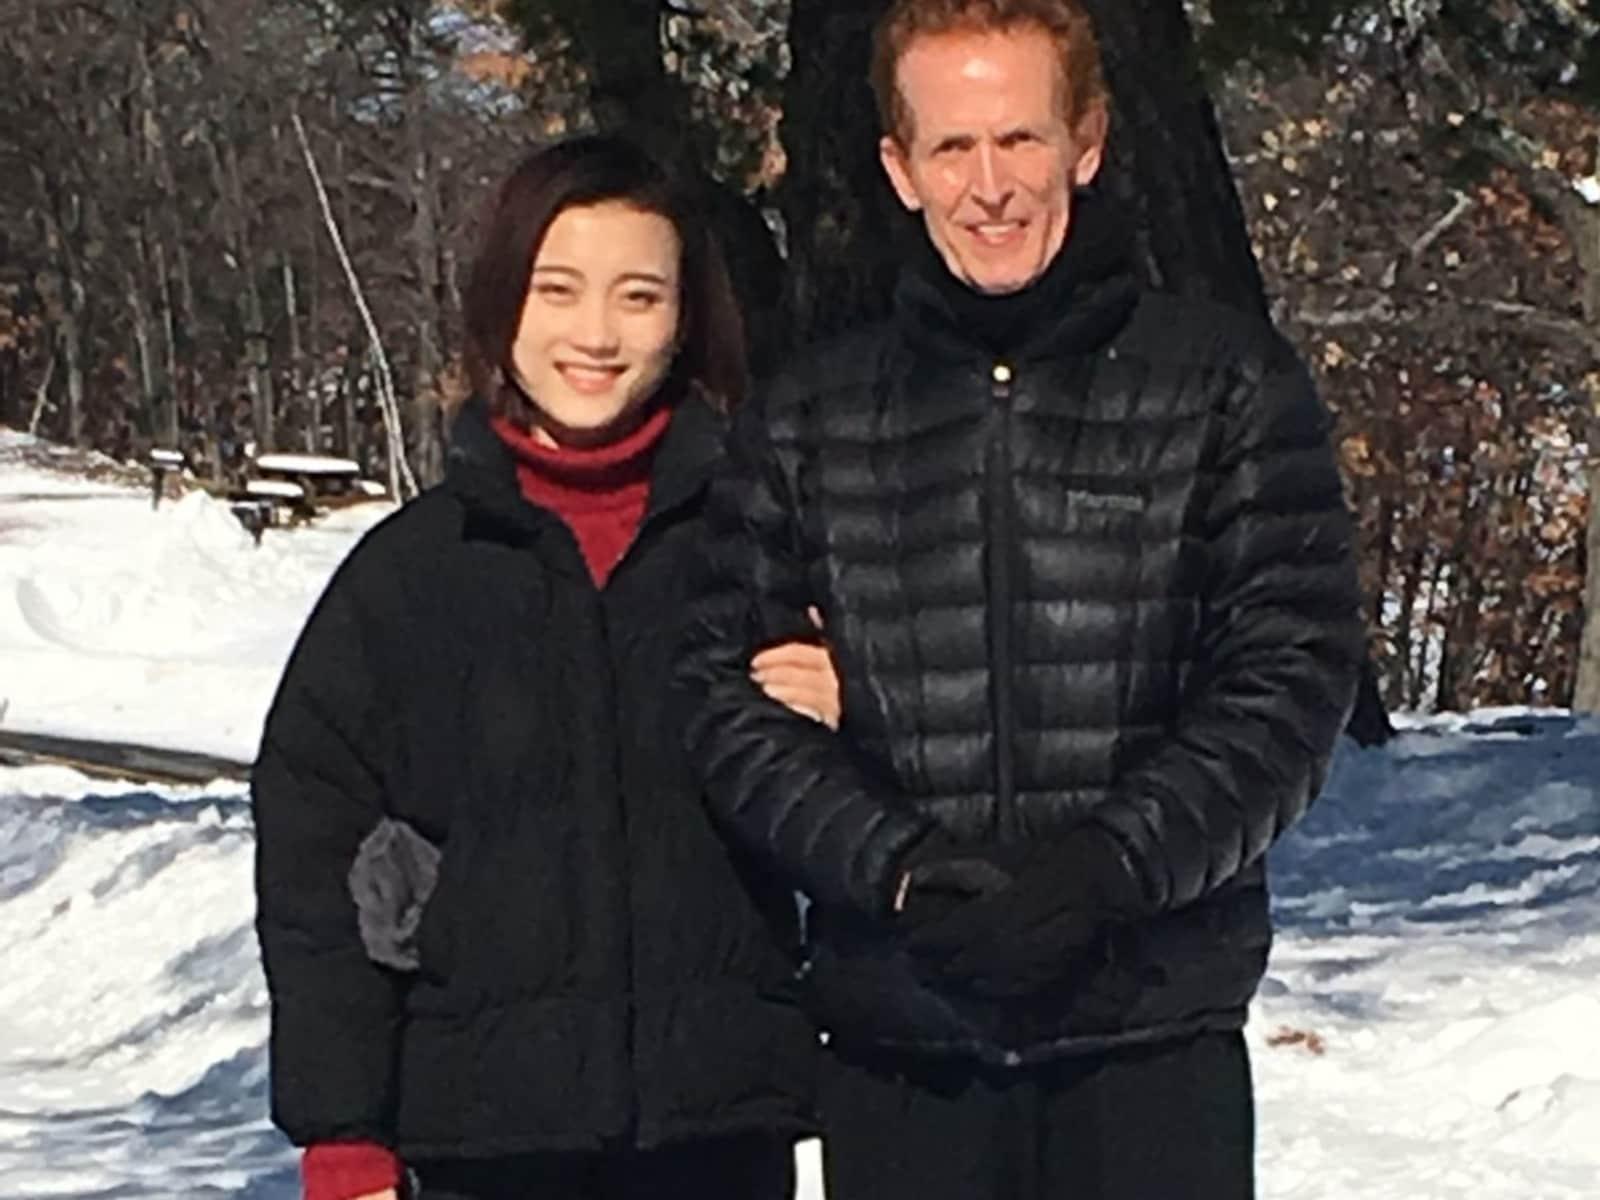 Xuecan & Peter from Boston, Massachusetts, United States